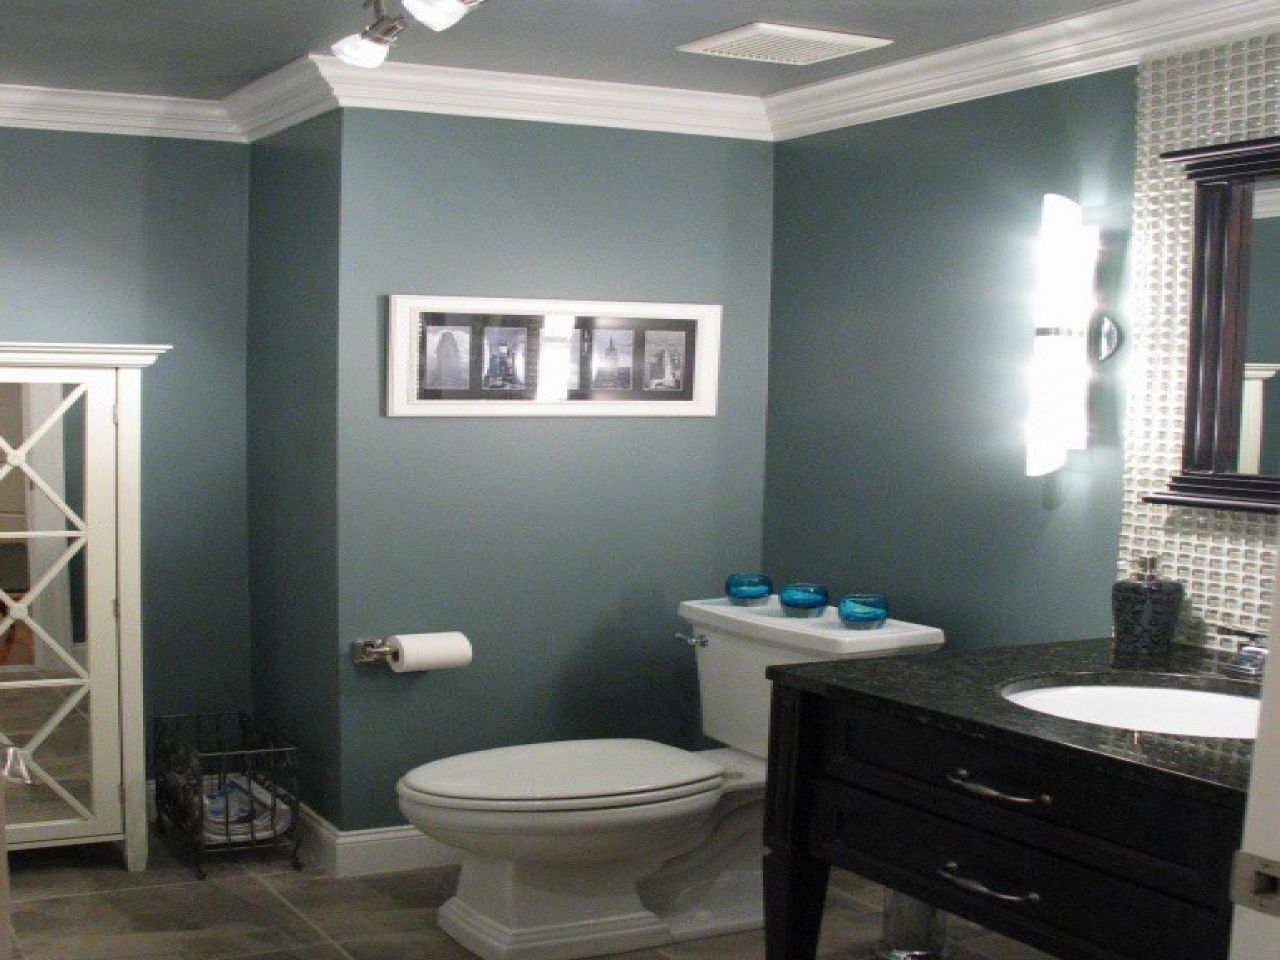 20+ Creative Grey Bathroom Ideas to Inspire You; Let's